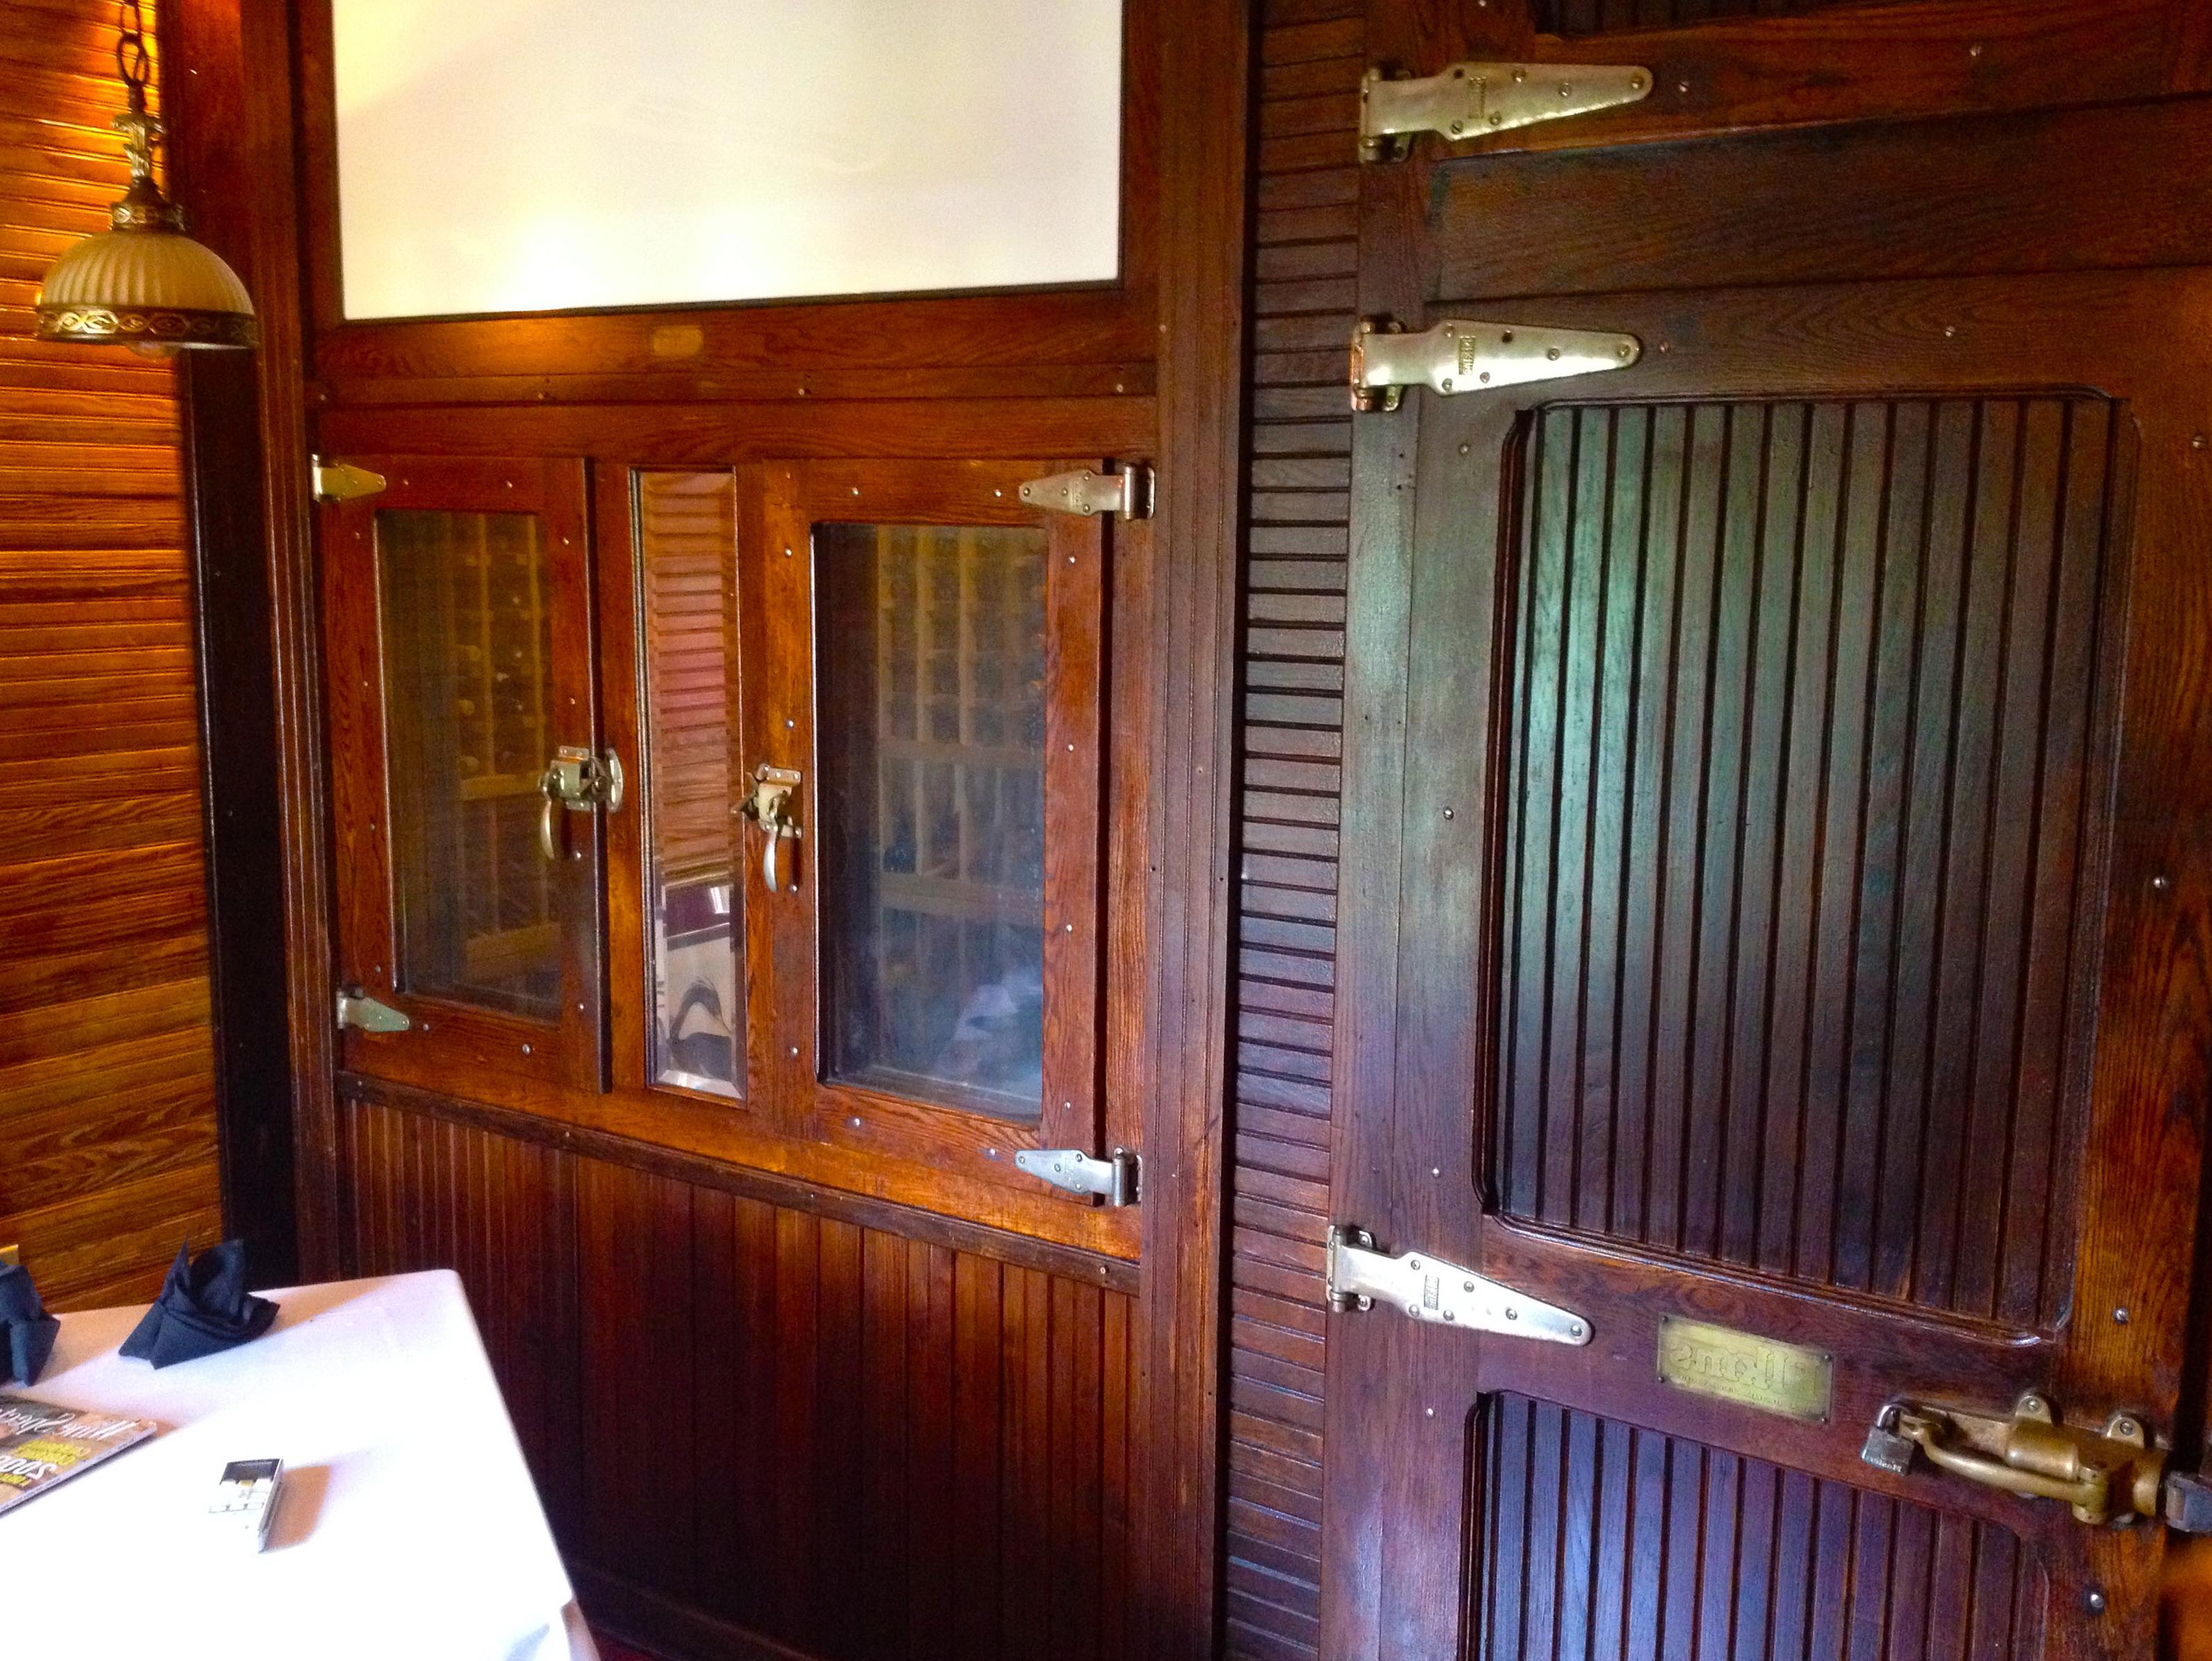 home design baton rouge martin wine cellar baton rouge baton rouge la home design ideas. Interior Design Ideas. Home Design Ideas